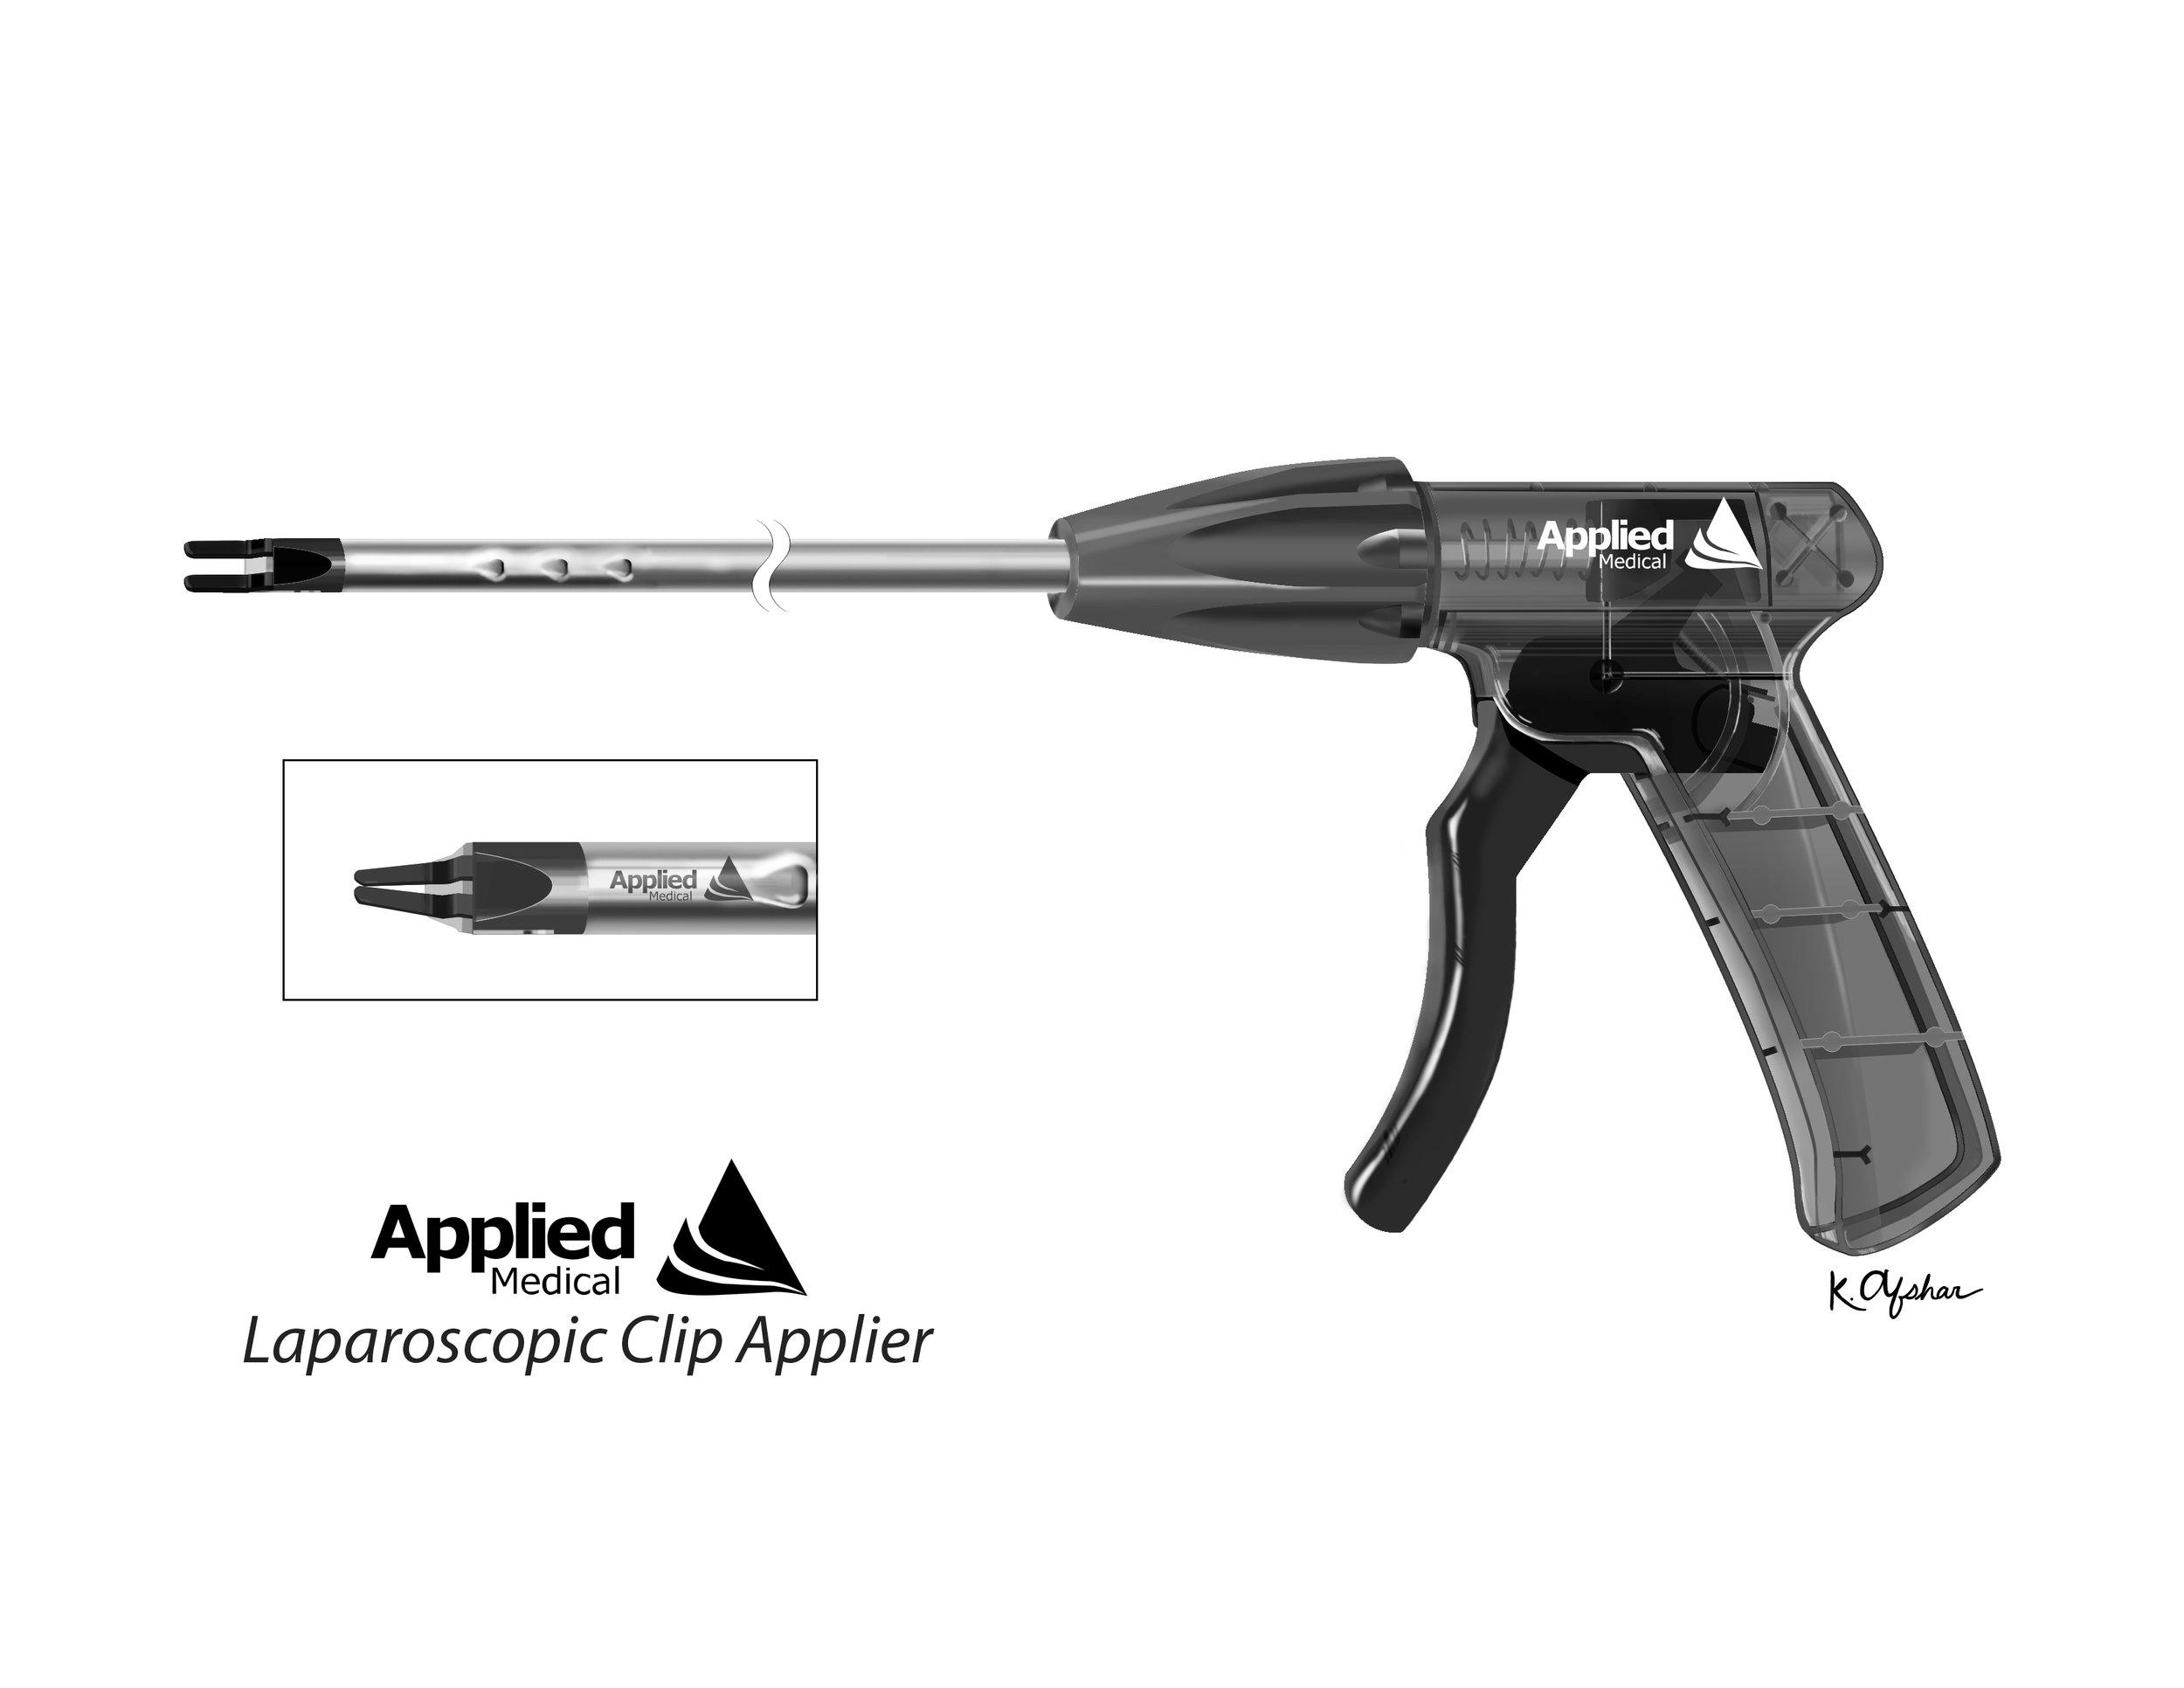 LAPAROSCOPIC CLIP APPLIER - Medium: Adobe Photoshop & IllustratorAudience: Device ManufacturersProject Description: